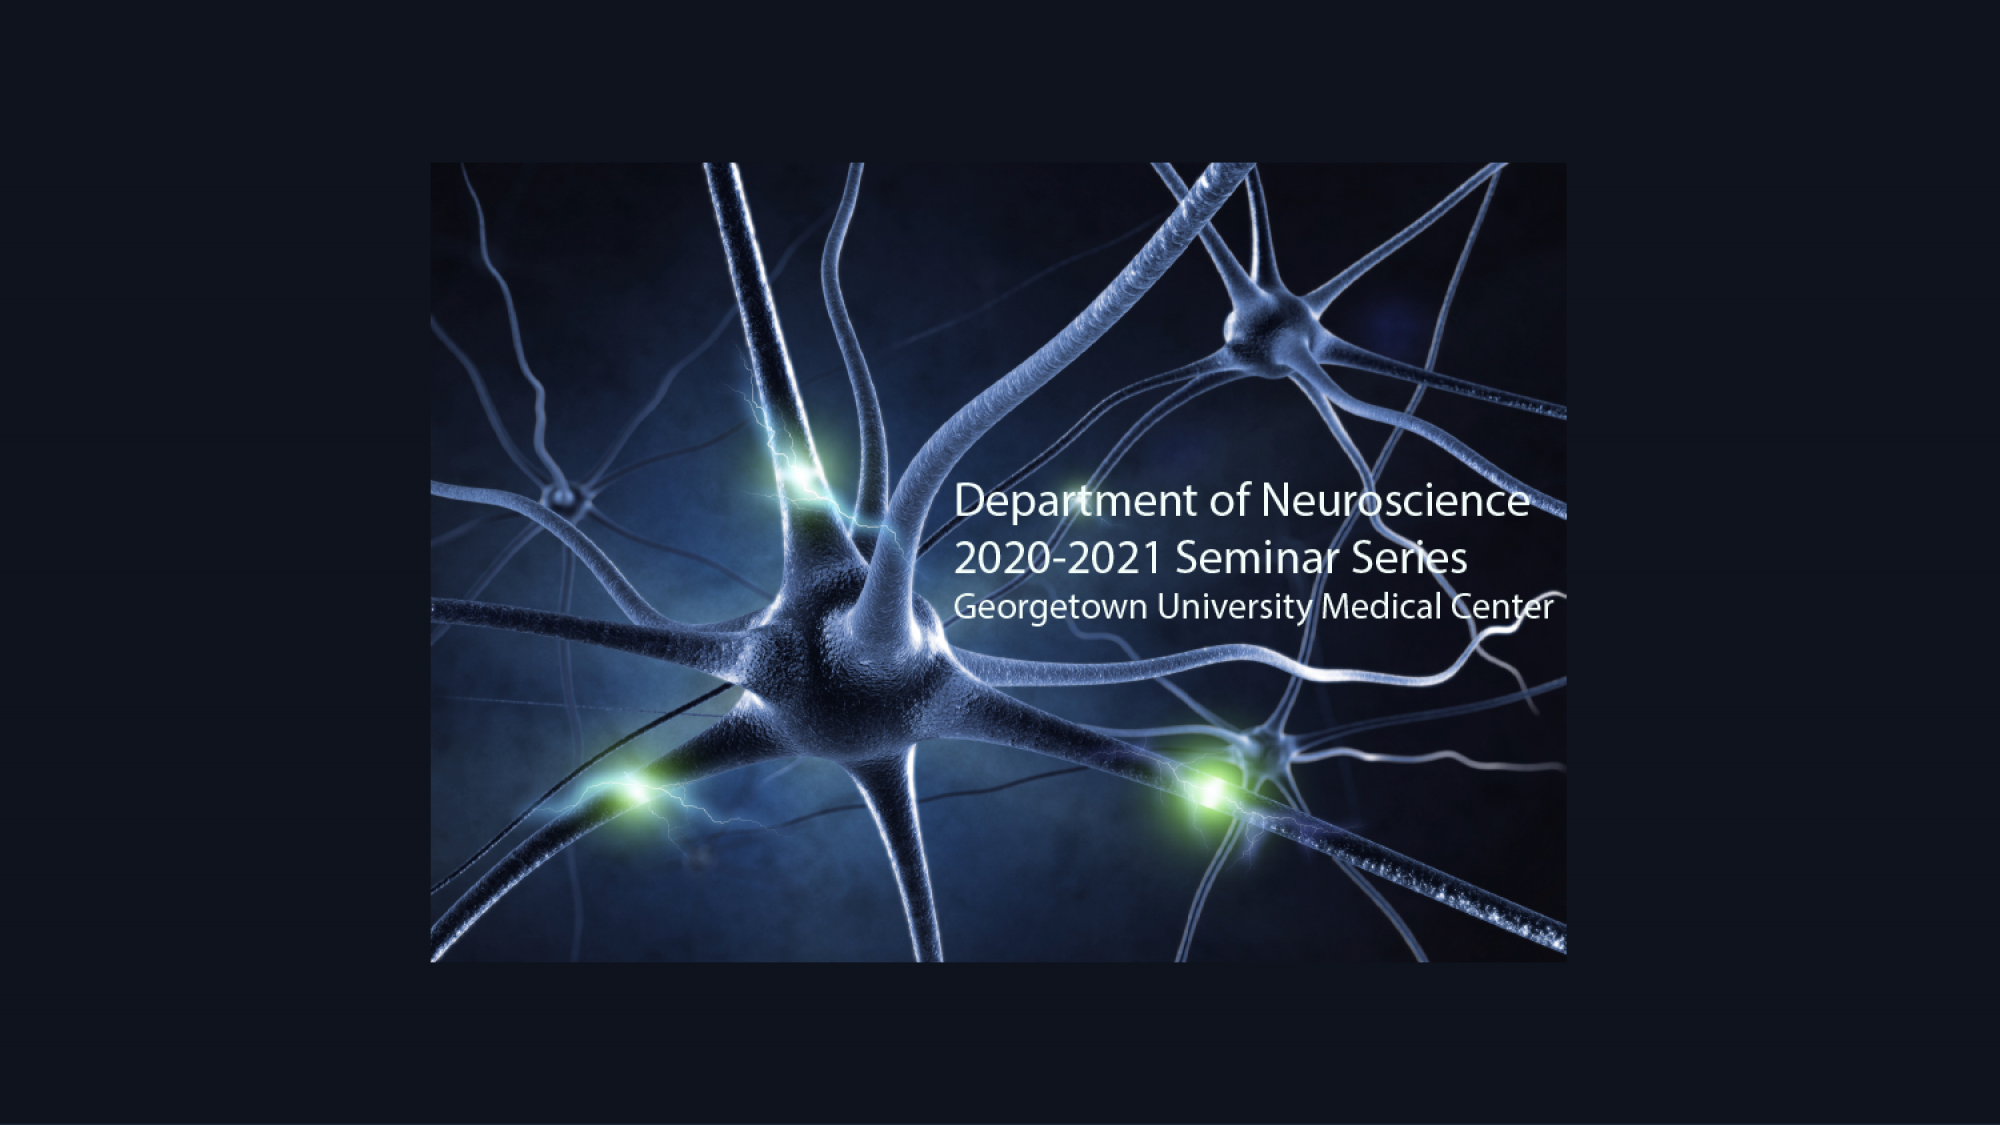 Neuroscience Seminar Series